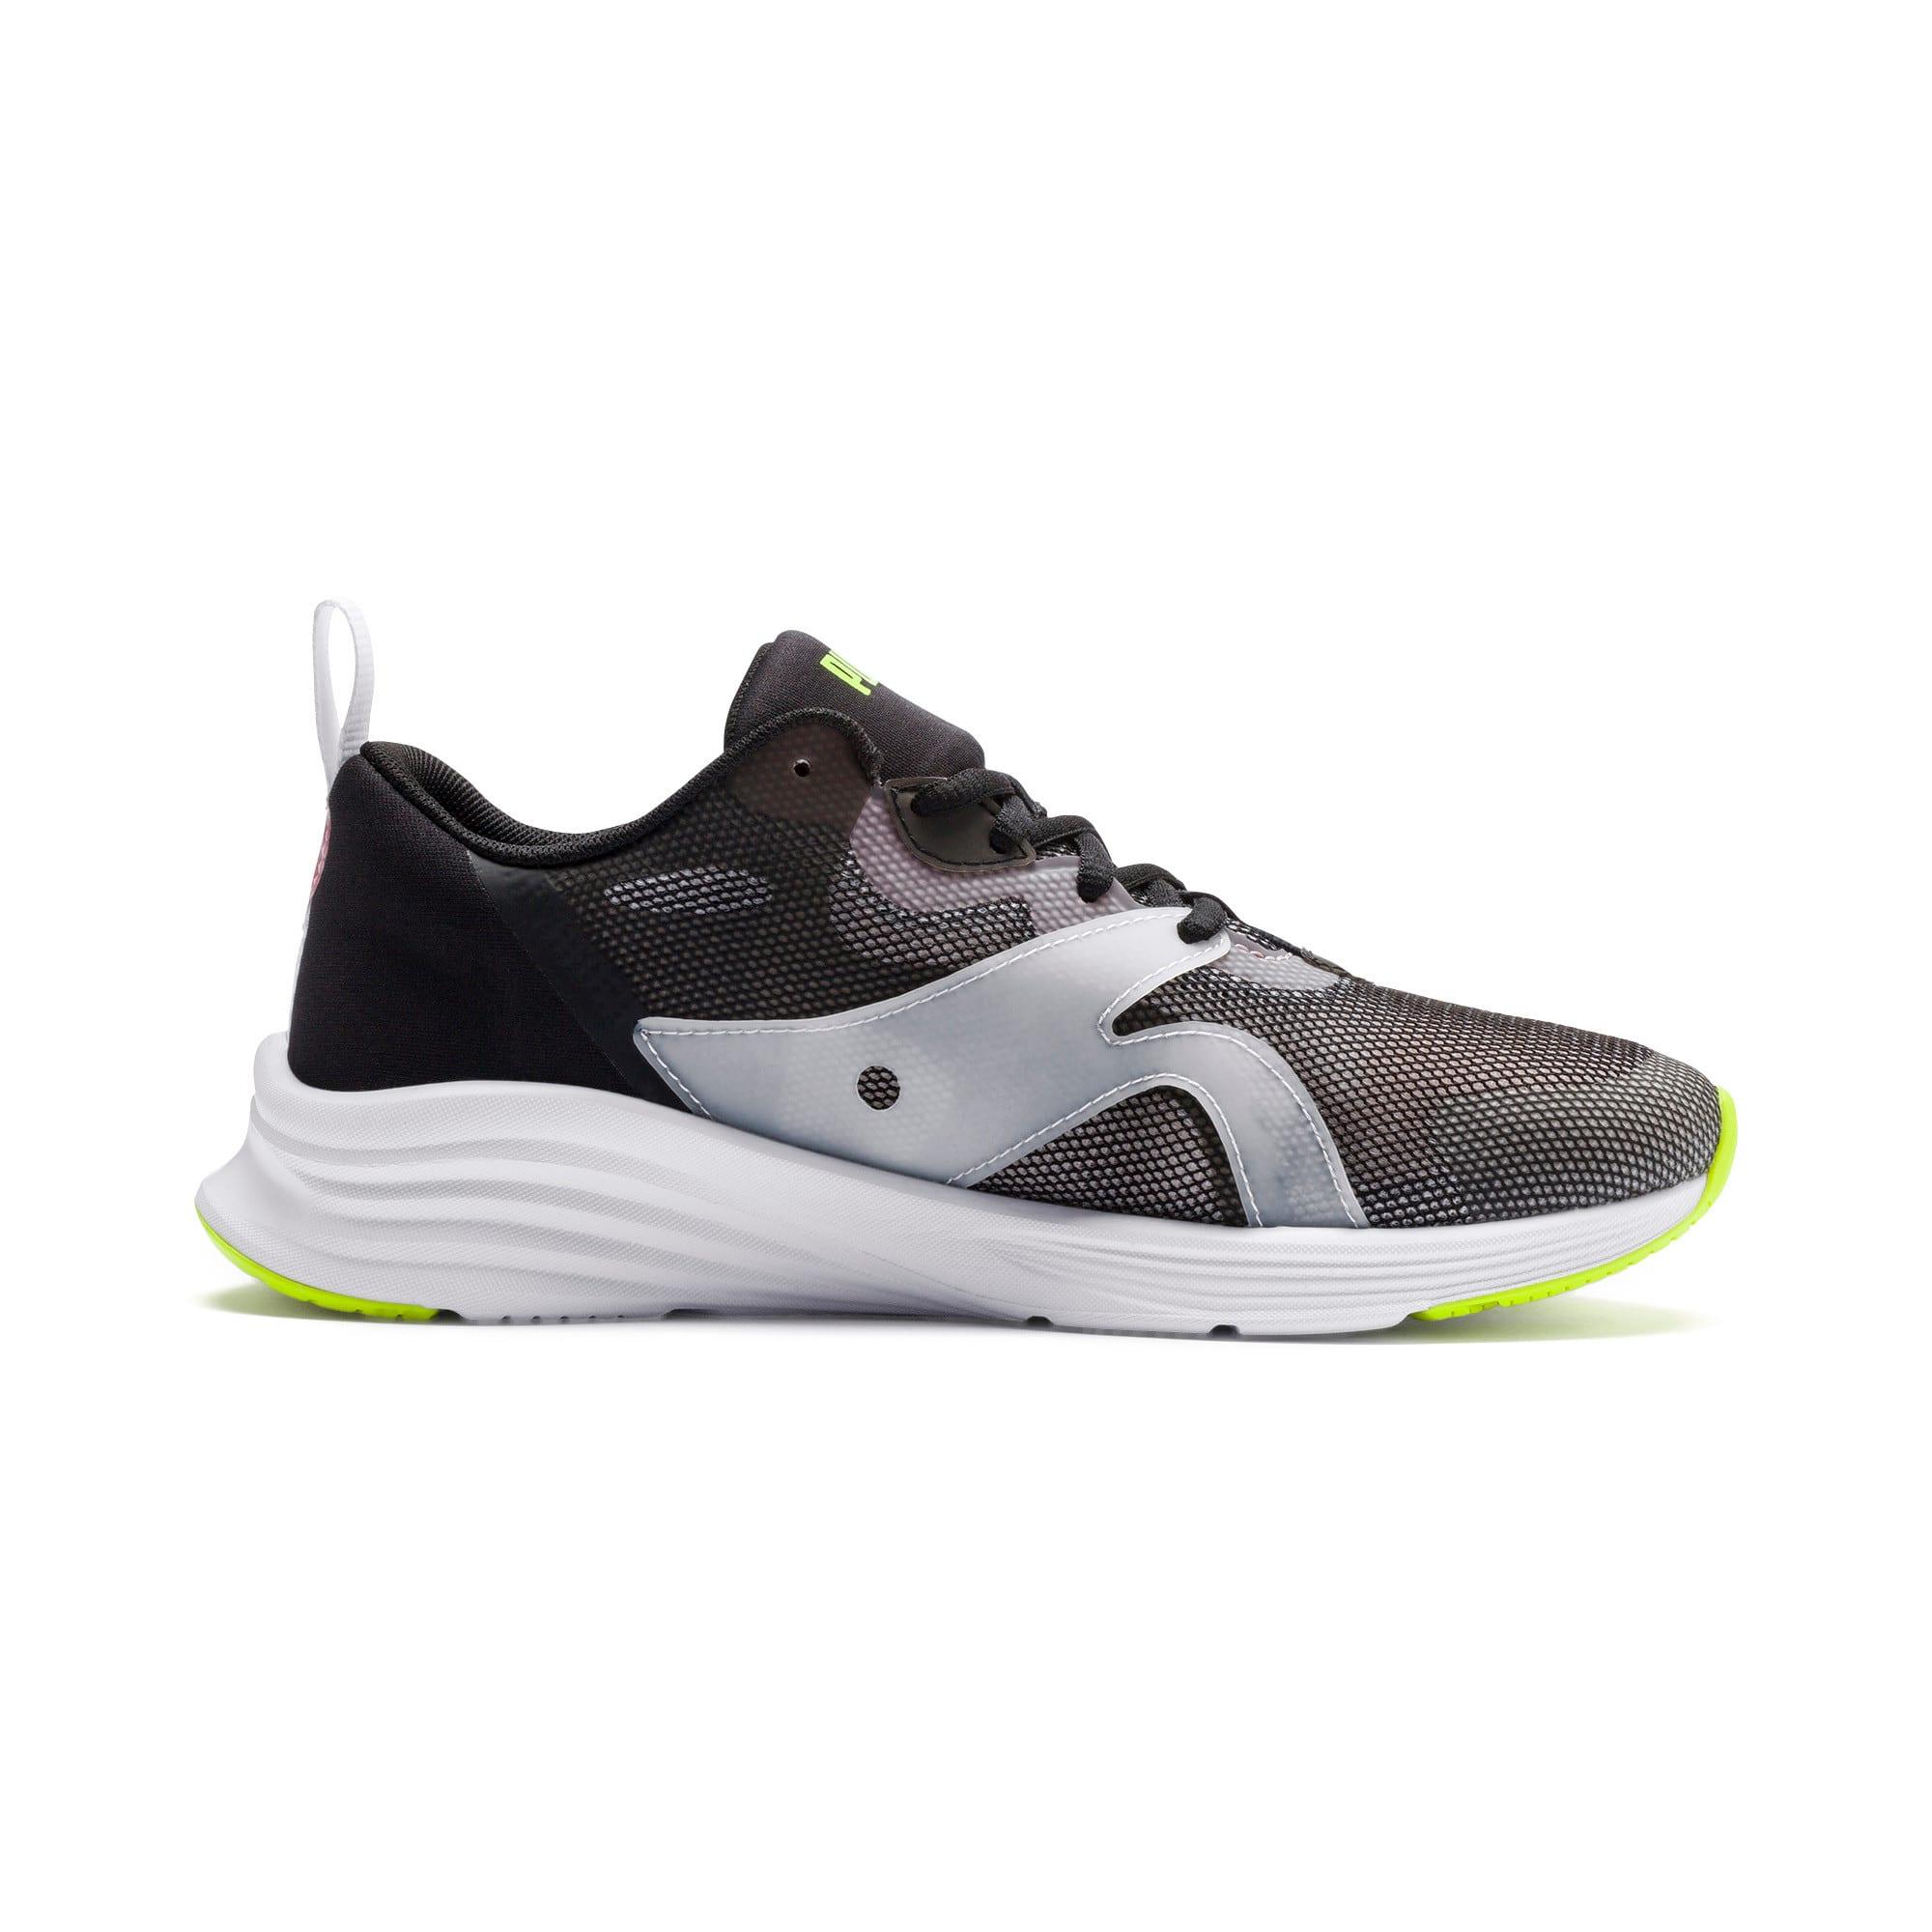 Thumbnail 6 of HYBRID Fuego Shift Women's Running Shoes, Puma Black-Bridal Rose, medium